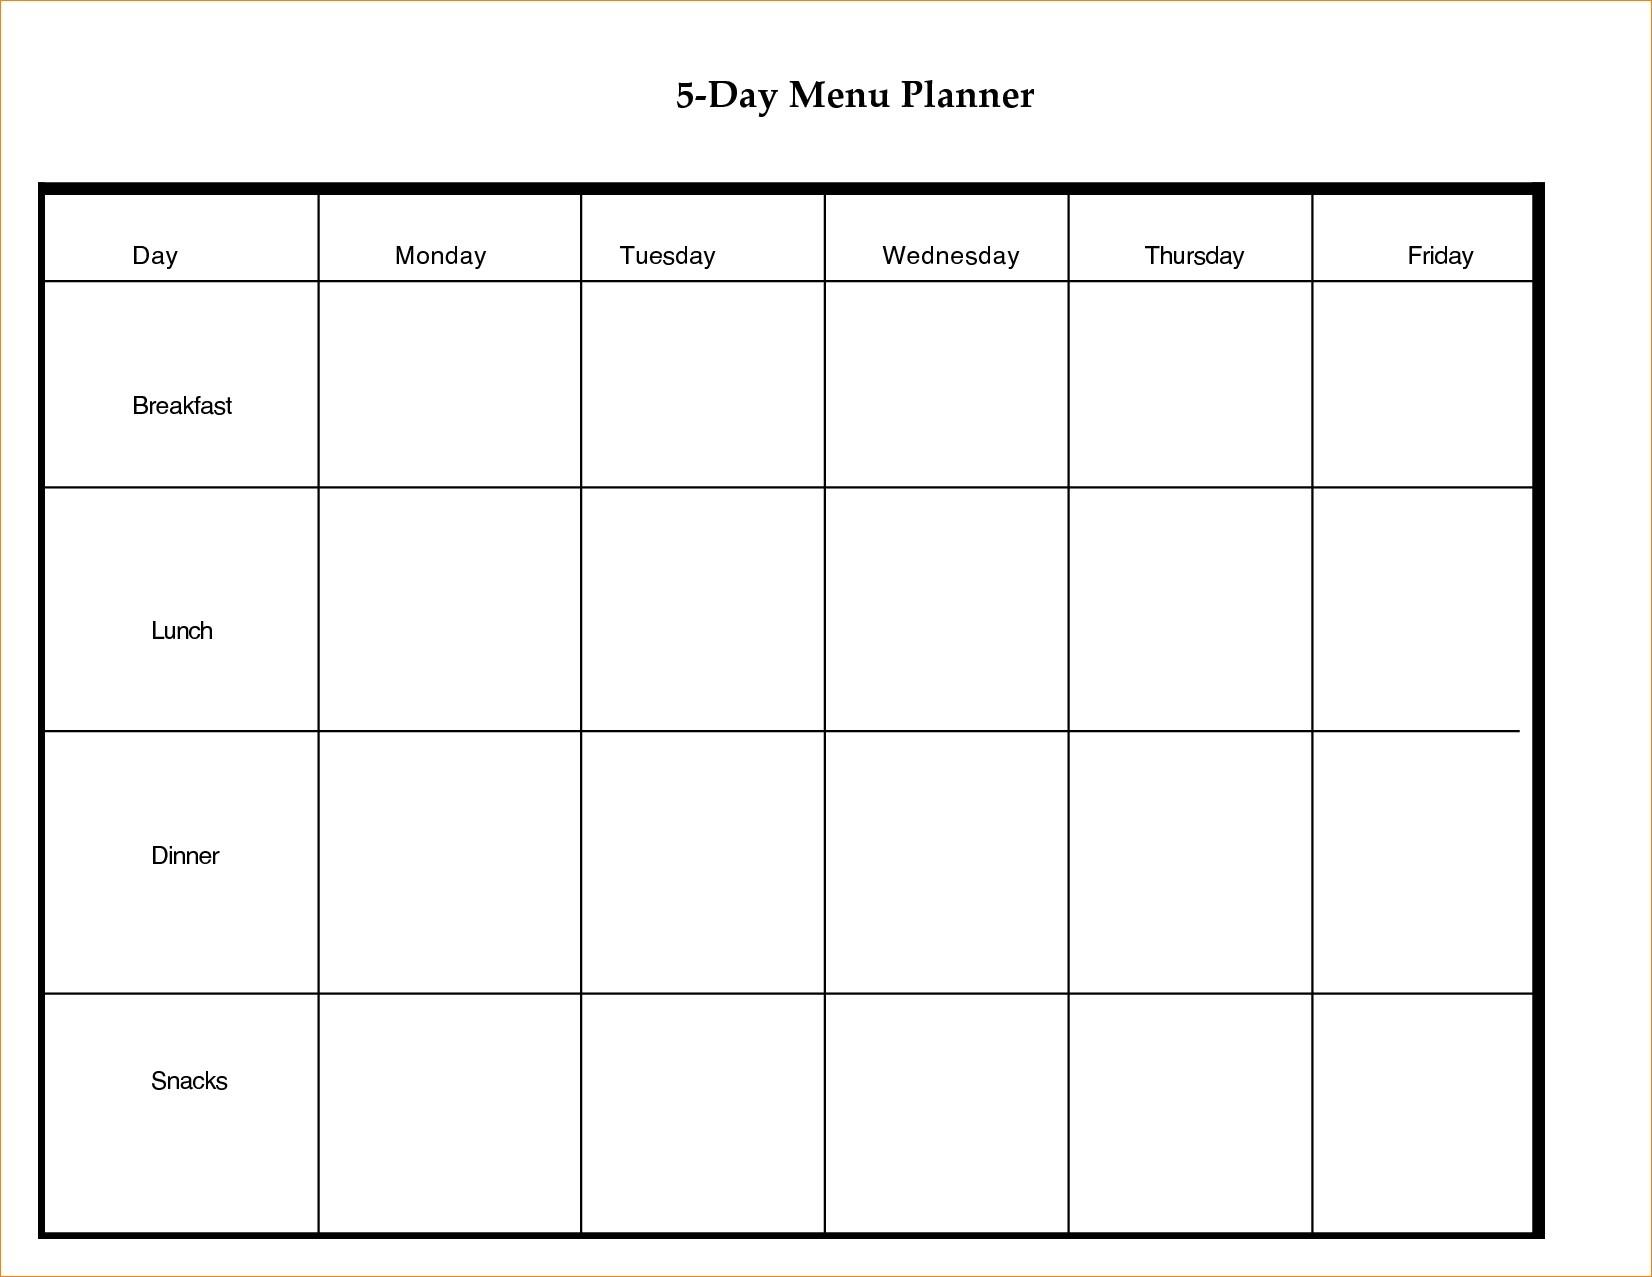 Printable 5 Day Calendar Blank Calendar Template 5 Day Week 0 8 With  Free Printable Blank Weekly Calendars